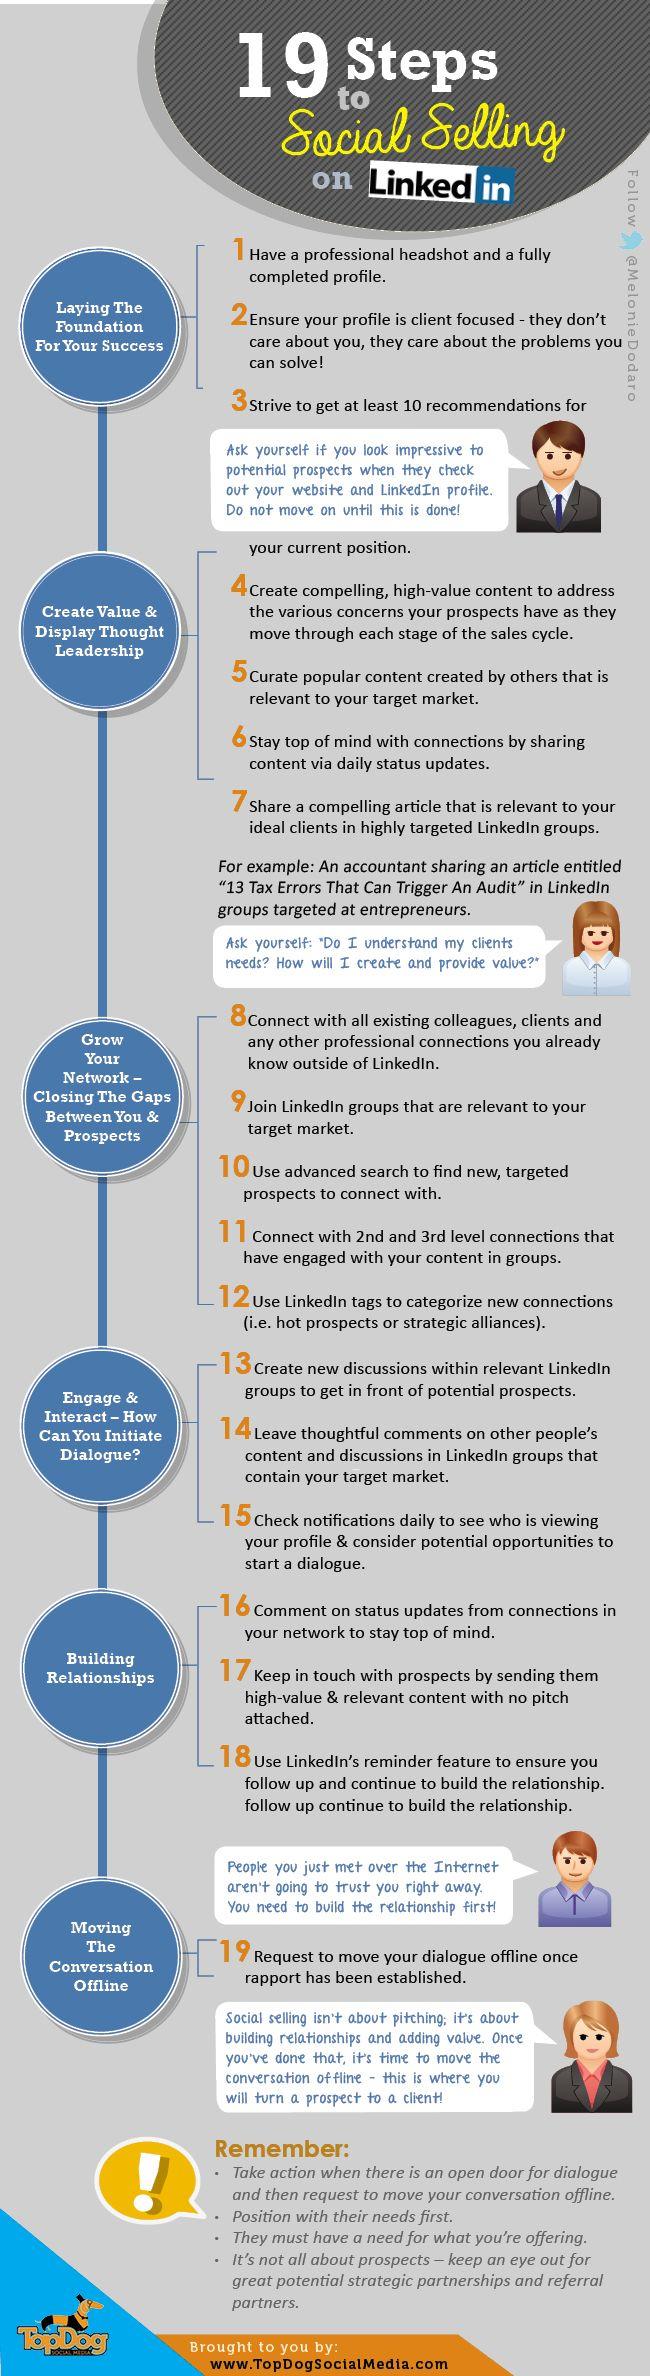 19 Steps to Social Selling on LinkedIn Social media